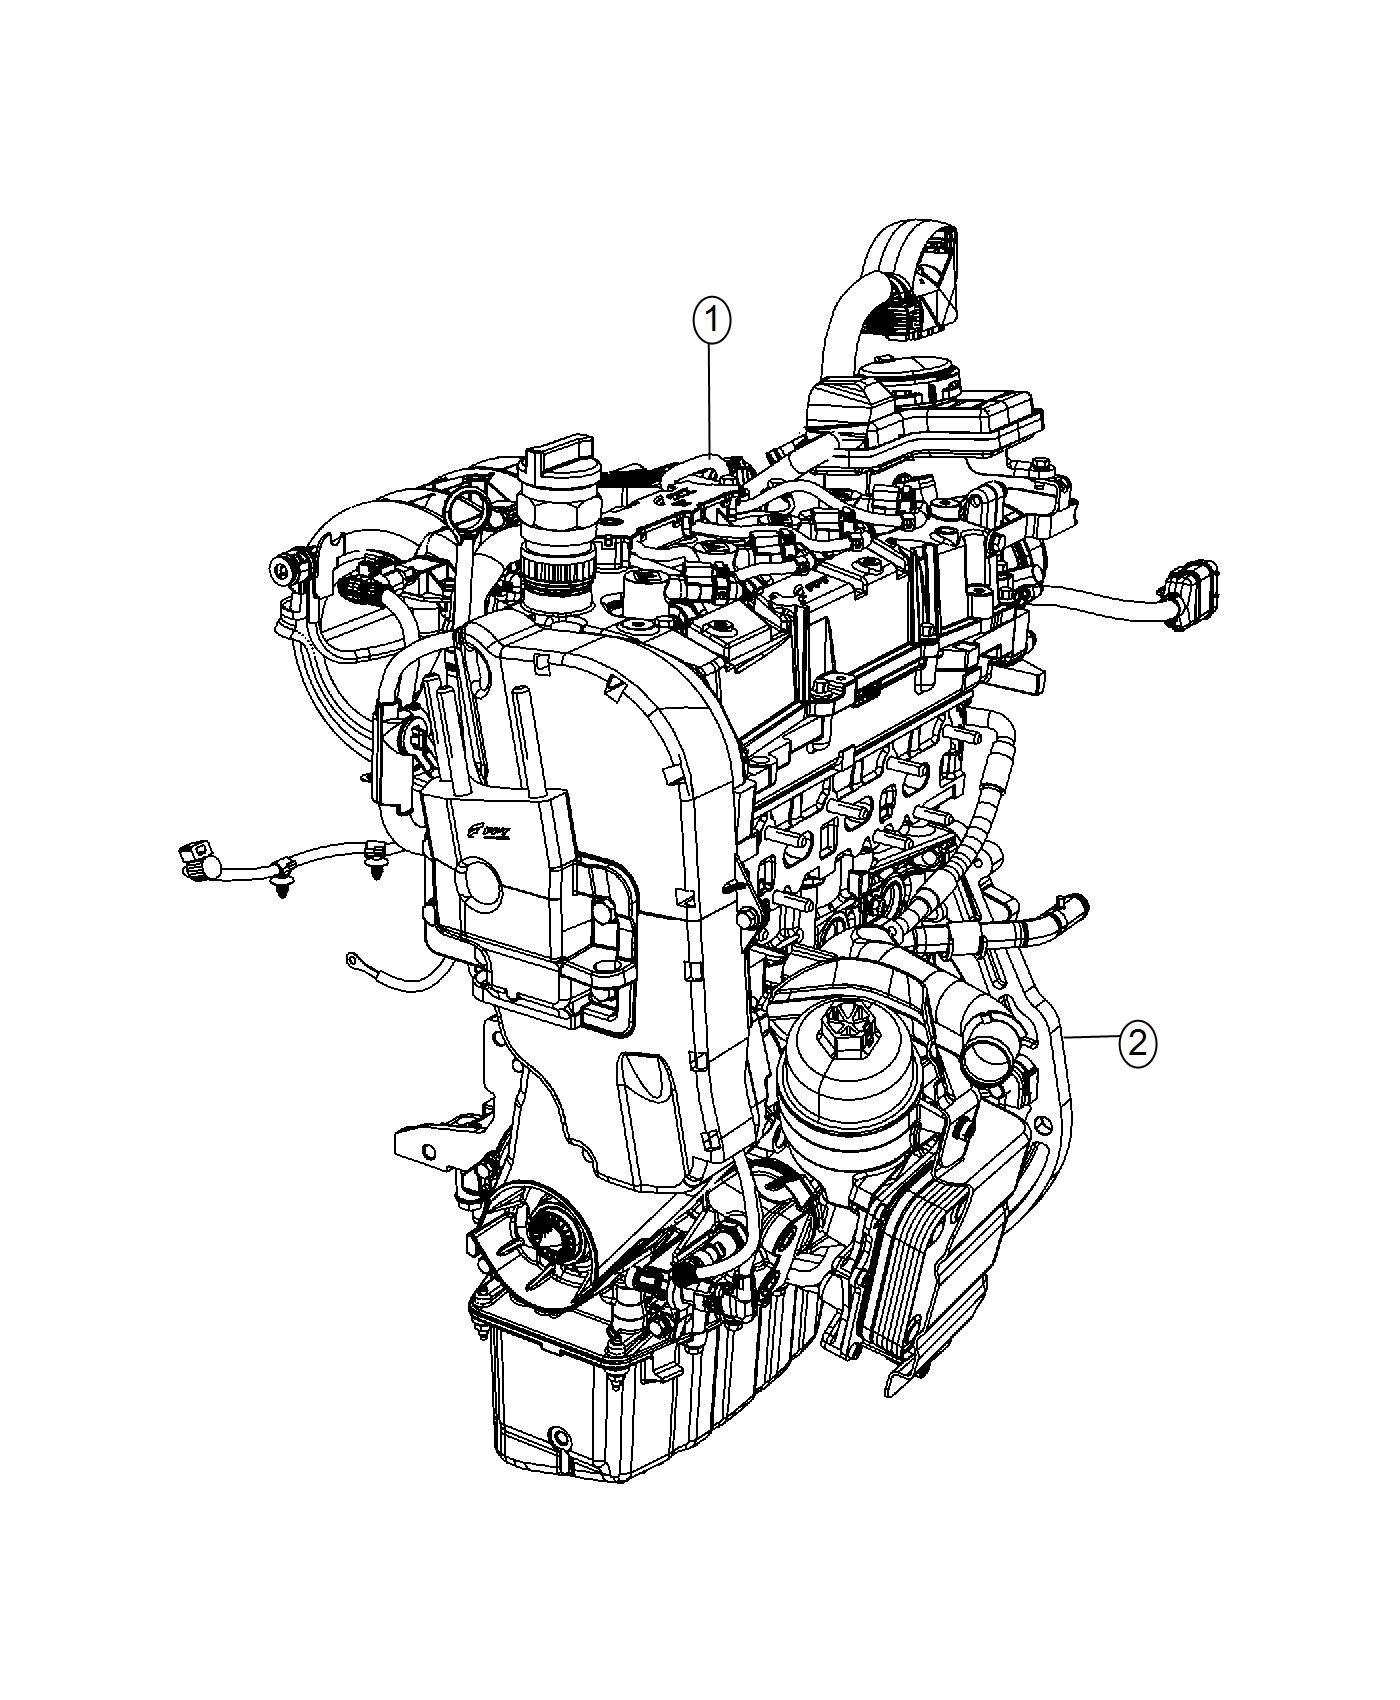 2016 Dodge Dart Engine kit. Long block. Heater, power